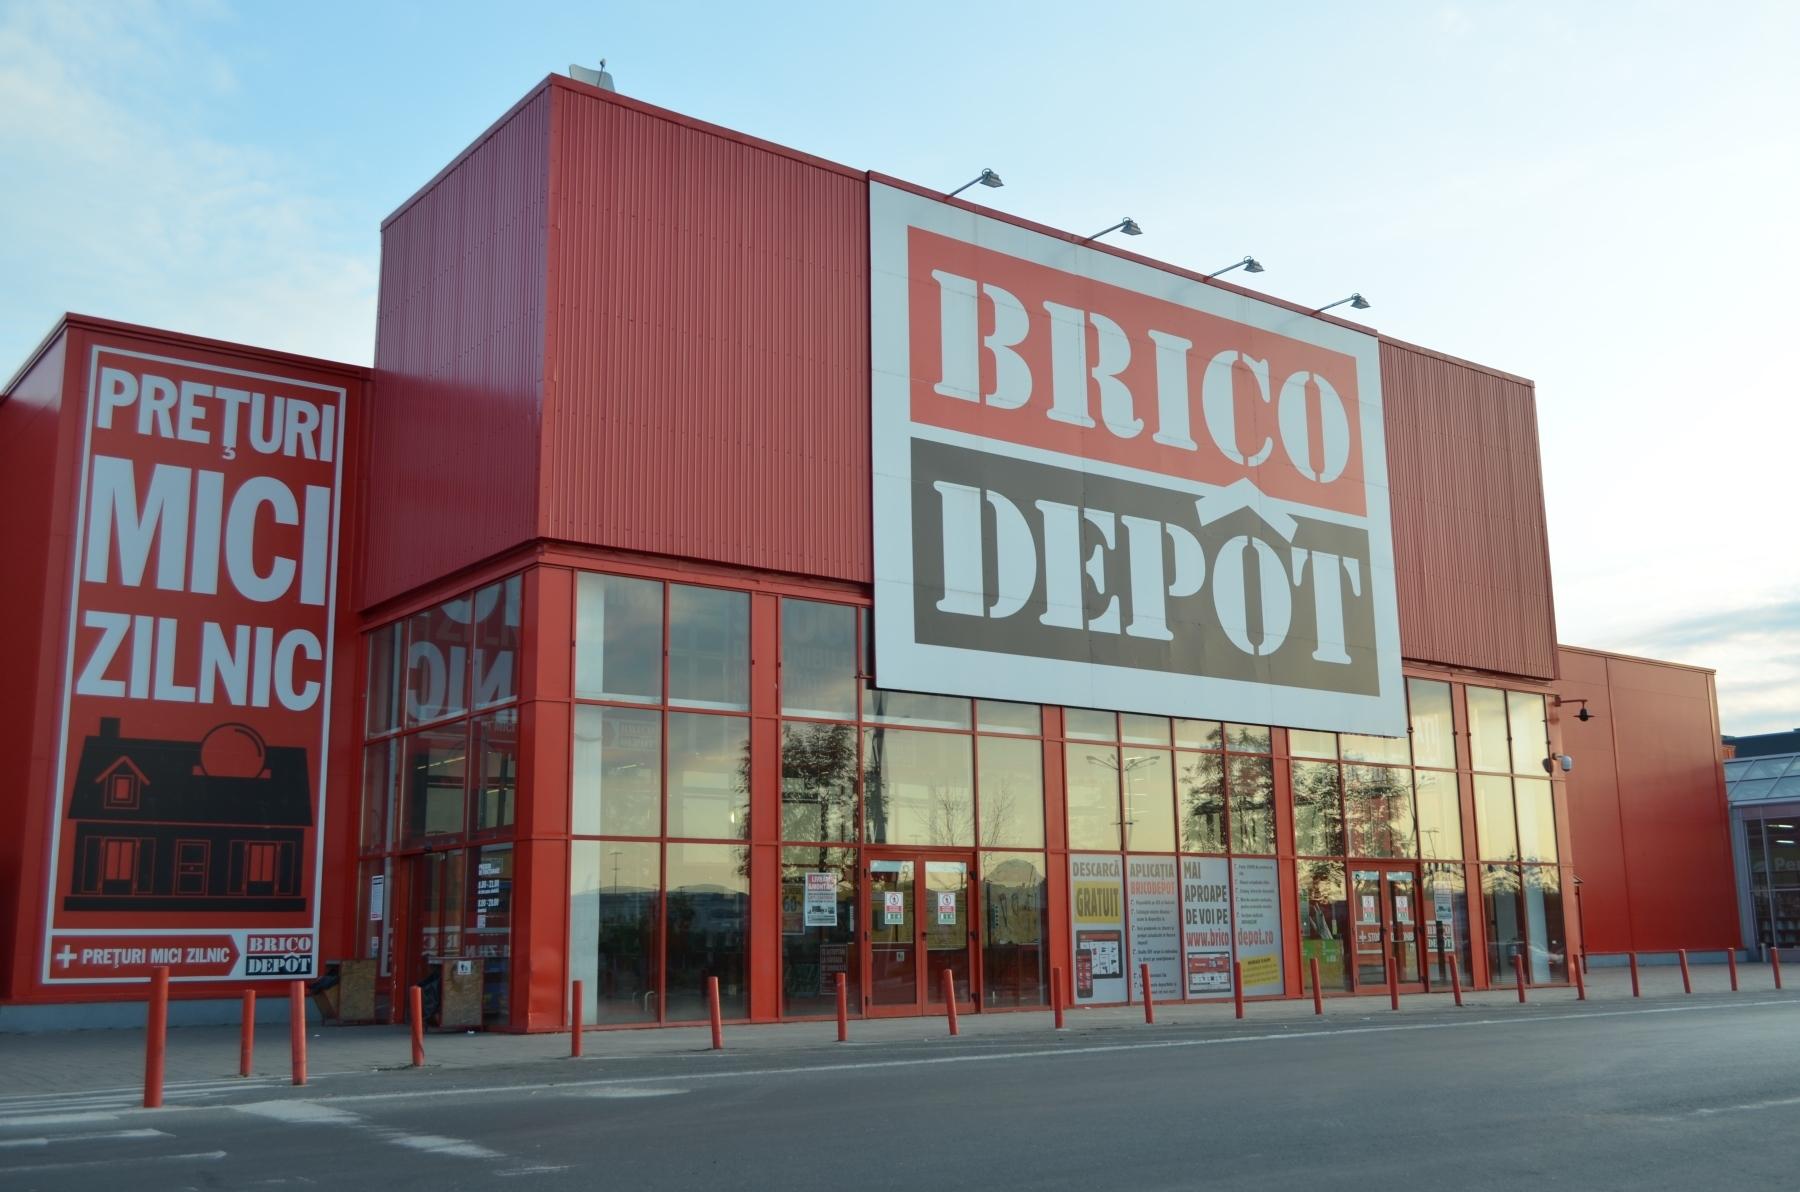 brico-depot-romania Impressionnant De Carport Brico Depot Des Idées